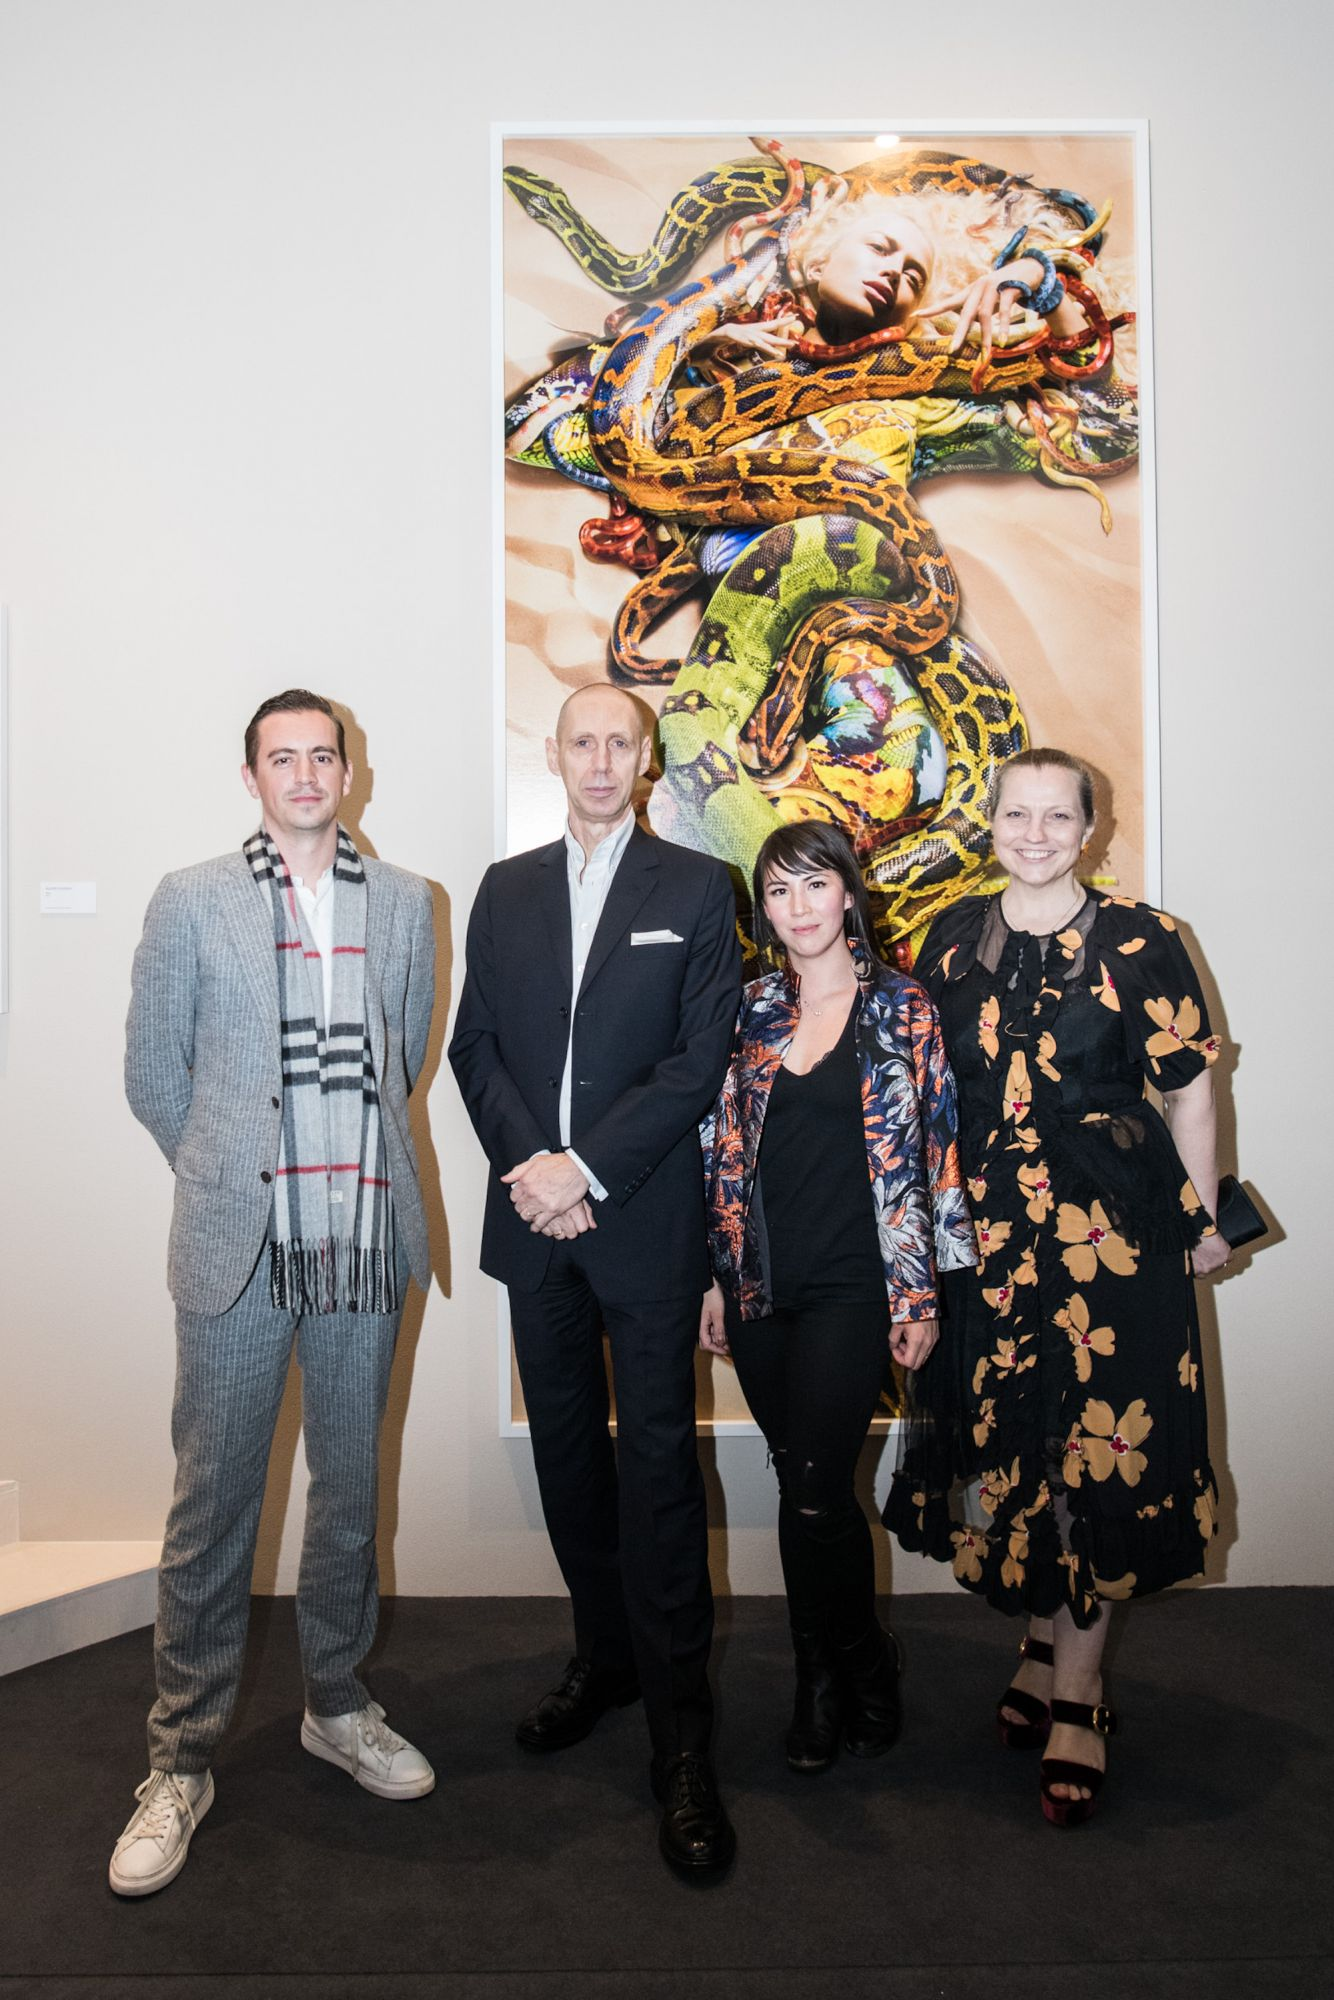 Christopher Owen, Nick Knight, Victoria Tang-Owen, Charlotte Knight